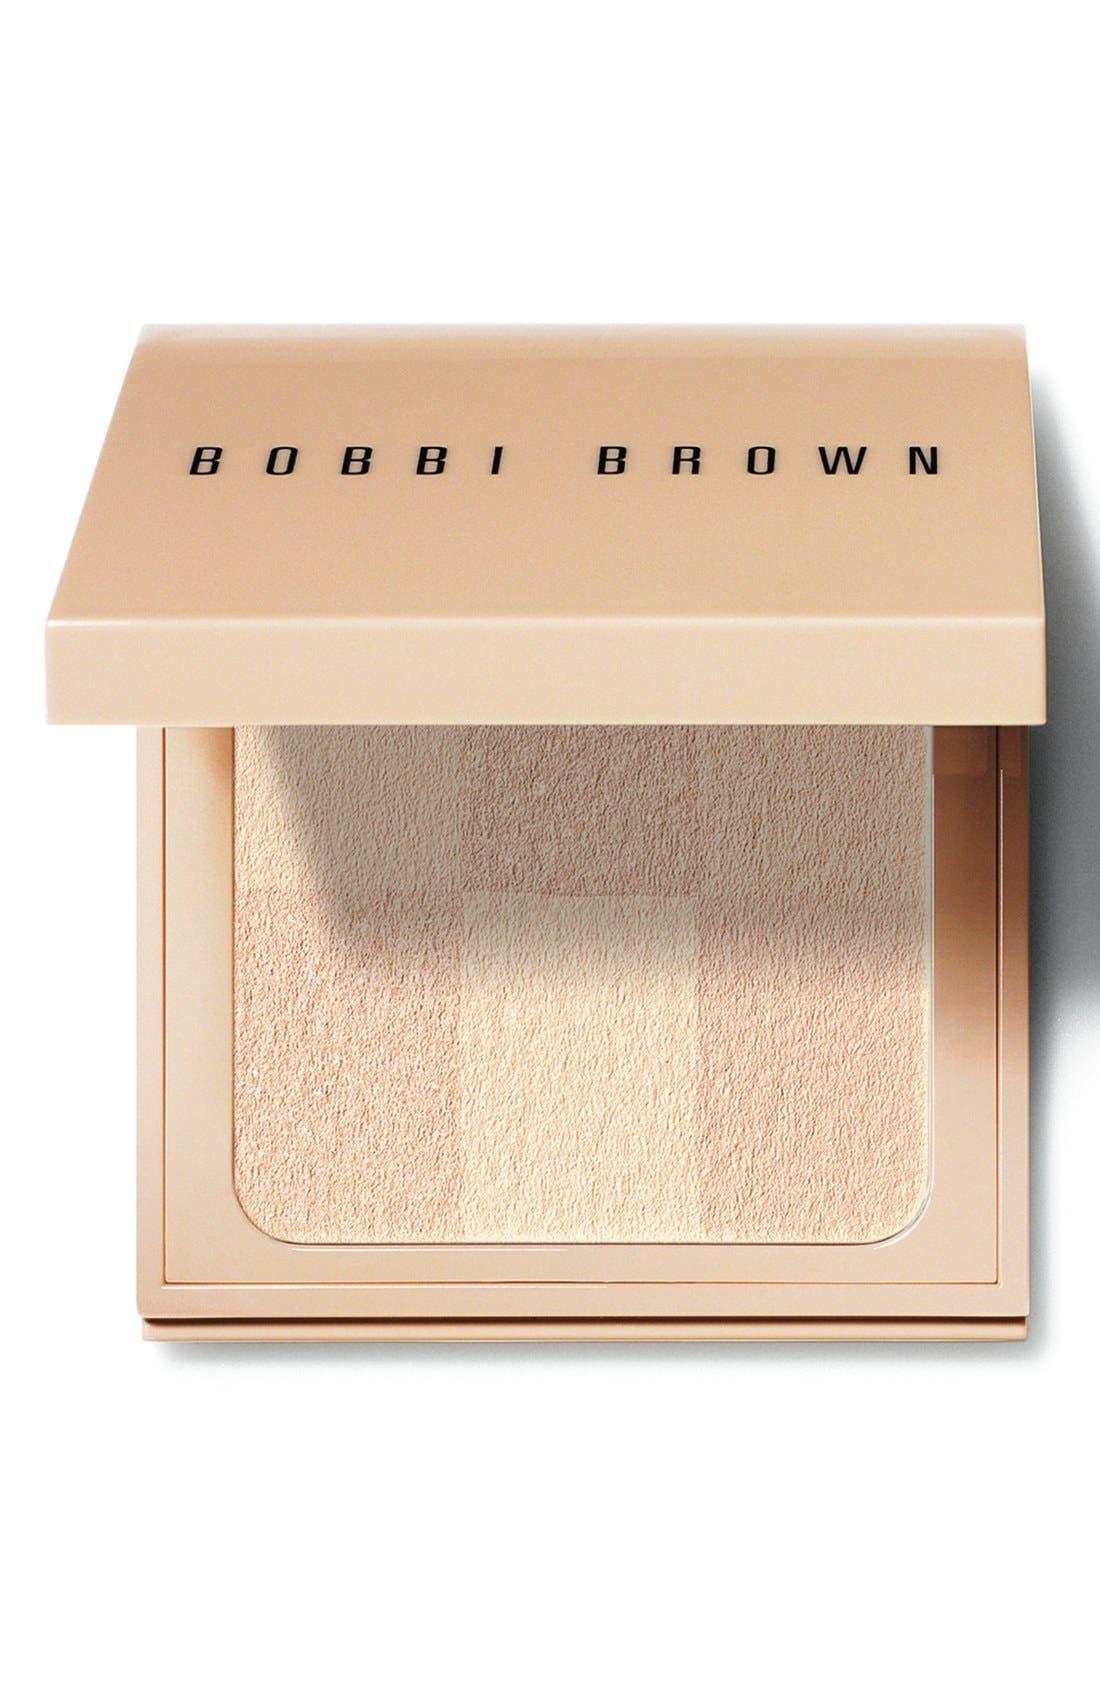 Nude Finish Illuminating Pressed Powder Compact